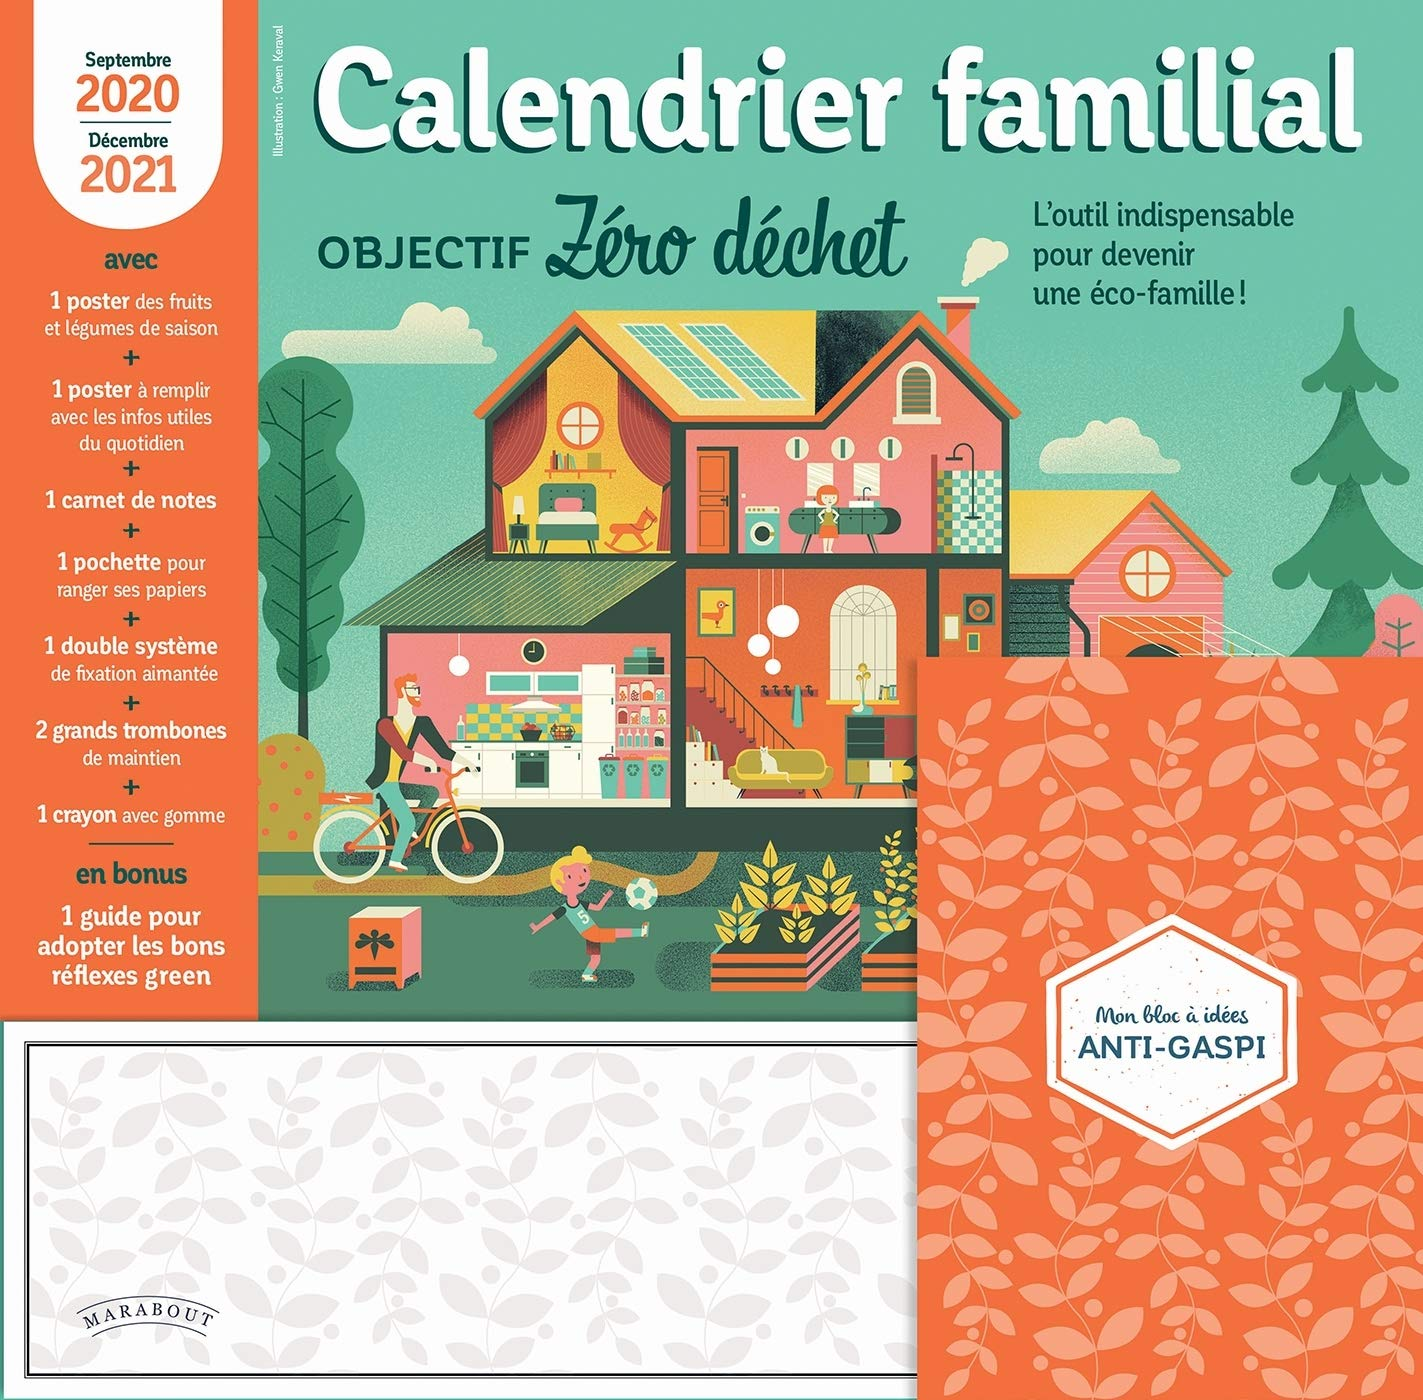 Calendrier Familial 2021 Calendrier familial objectif Zéro dechet 2020 2021 (Organisation